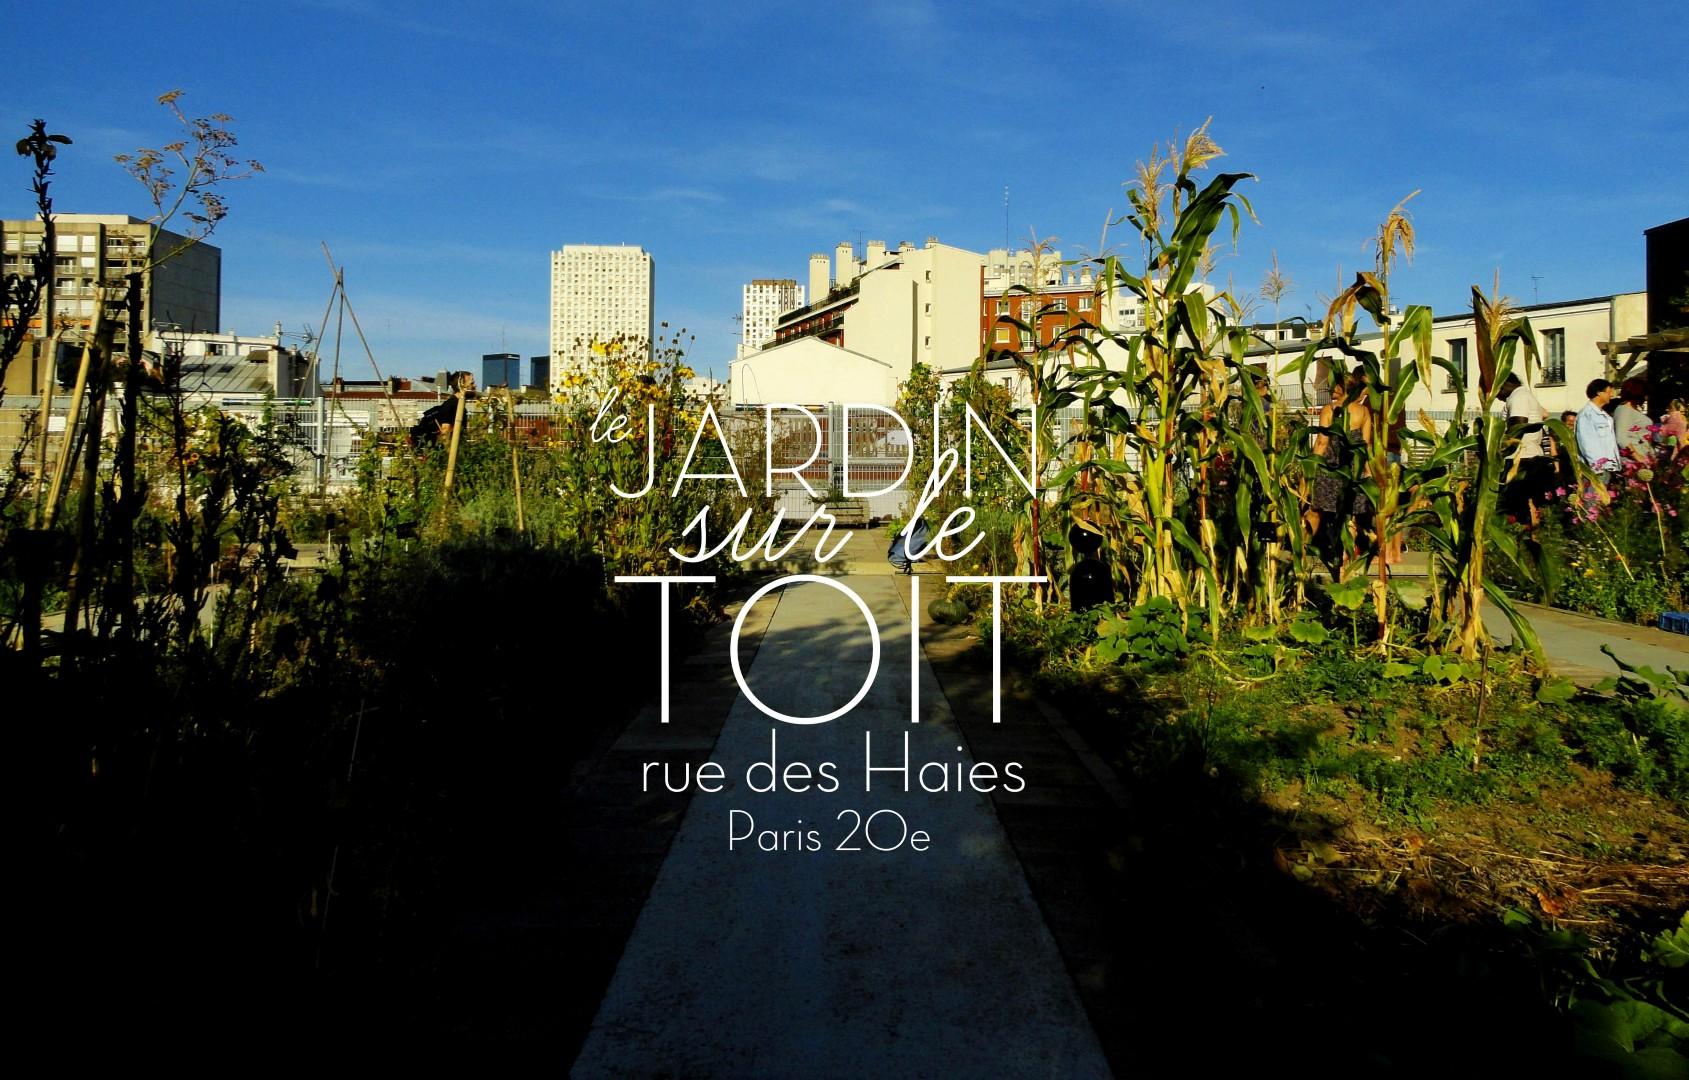 jardin-sur-toit-20e_v2 (Large)